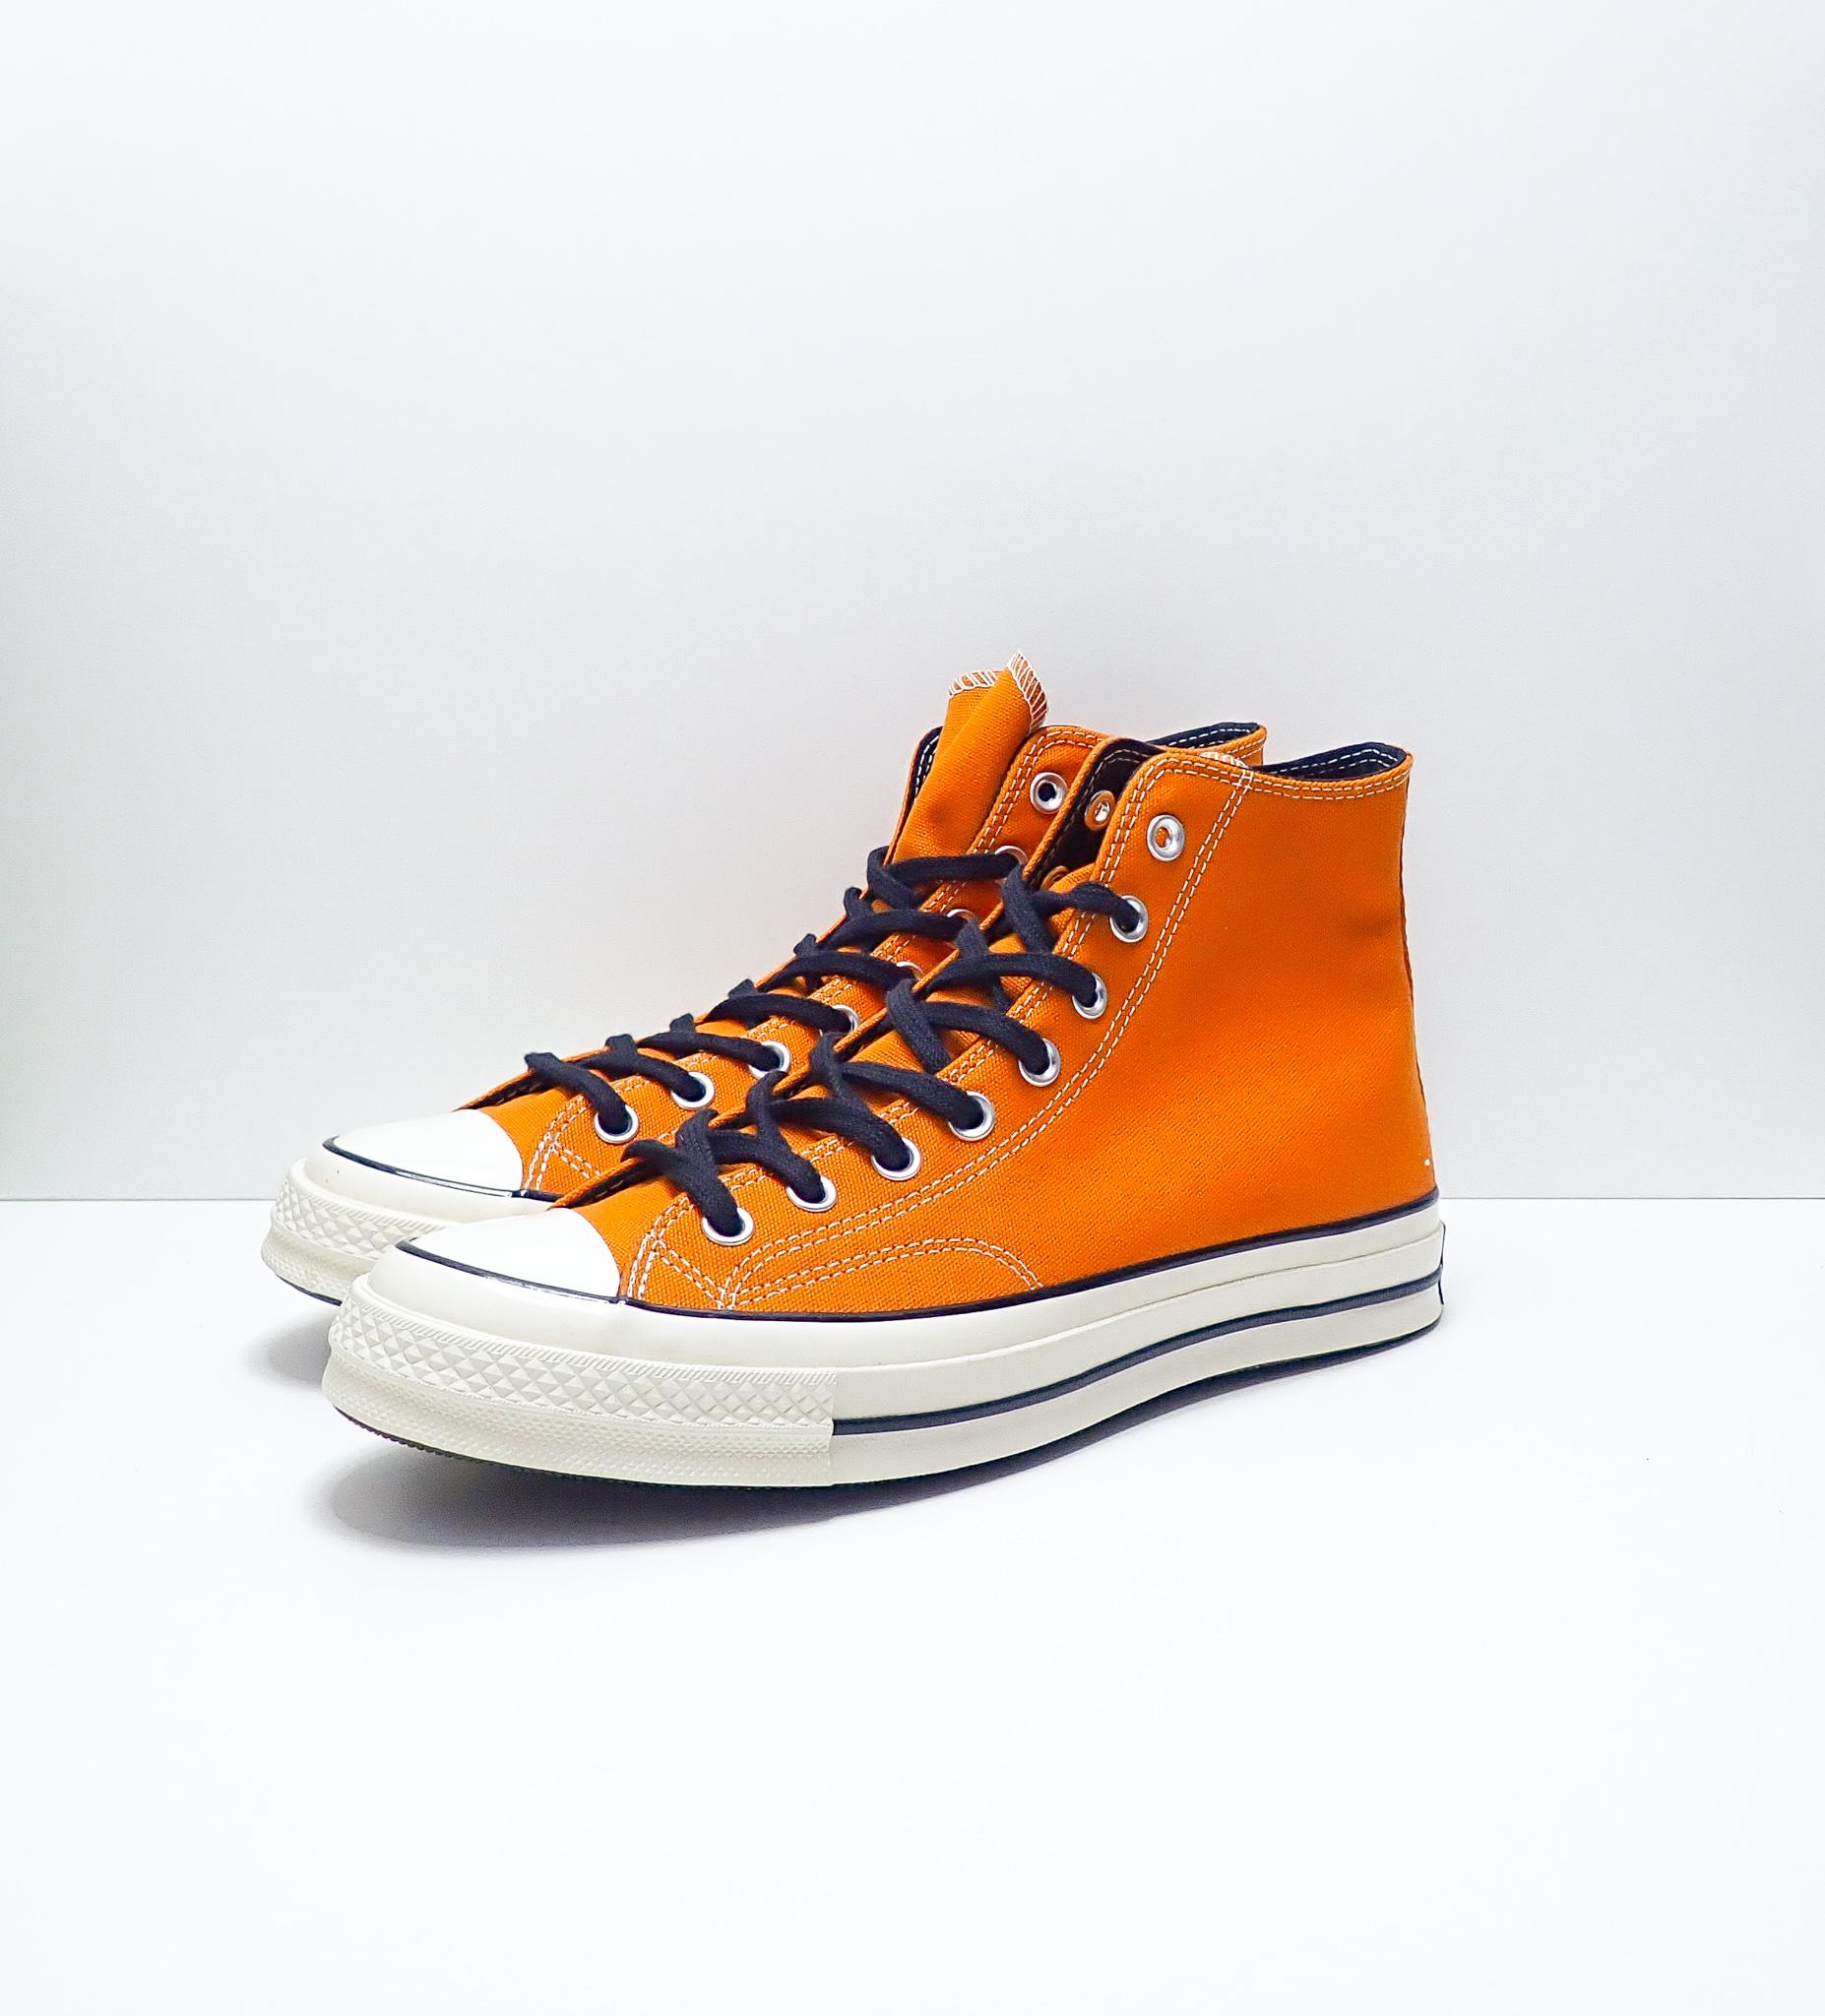 Converse Chuck Taylor 70's Orange